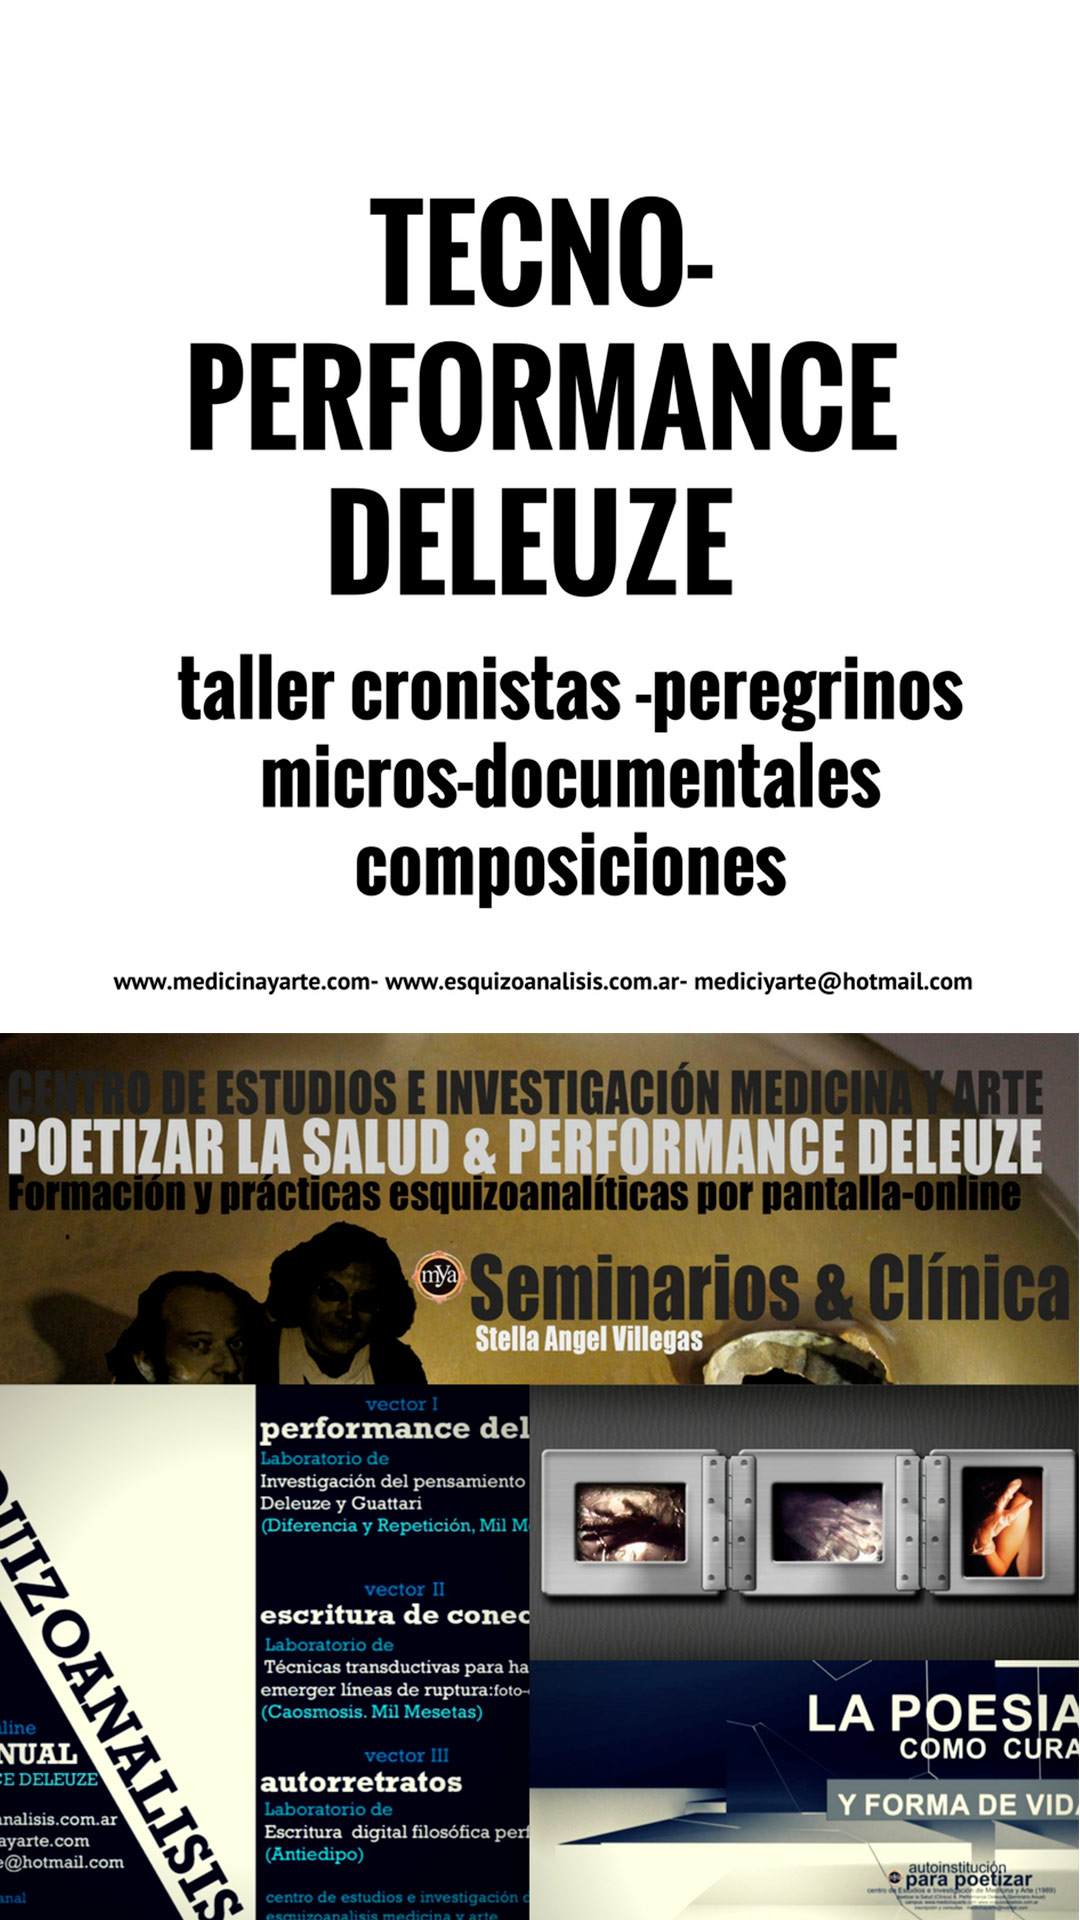 http://www.medicinayarte.com/img/TECNO-%20PERFORMANCE%20DELEUZE2.jpg